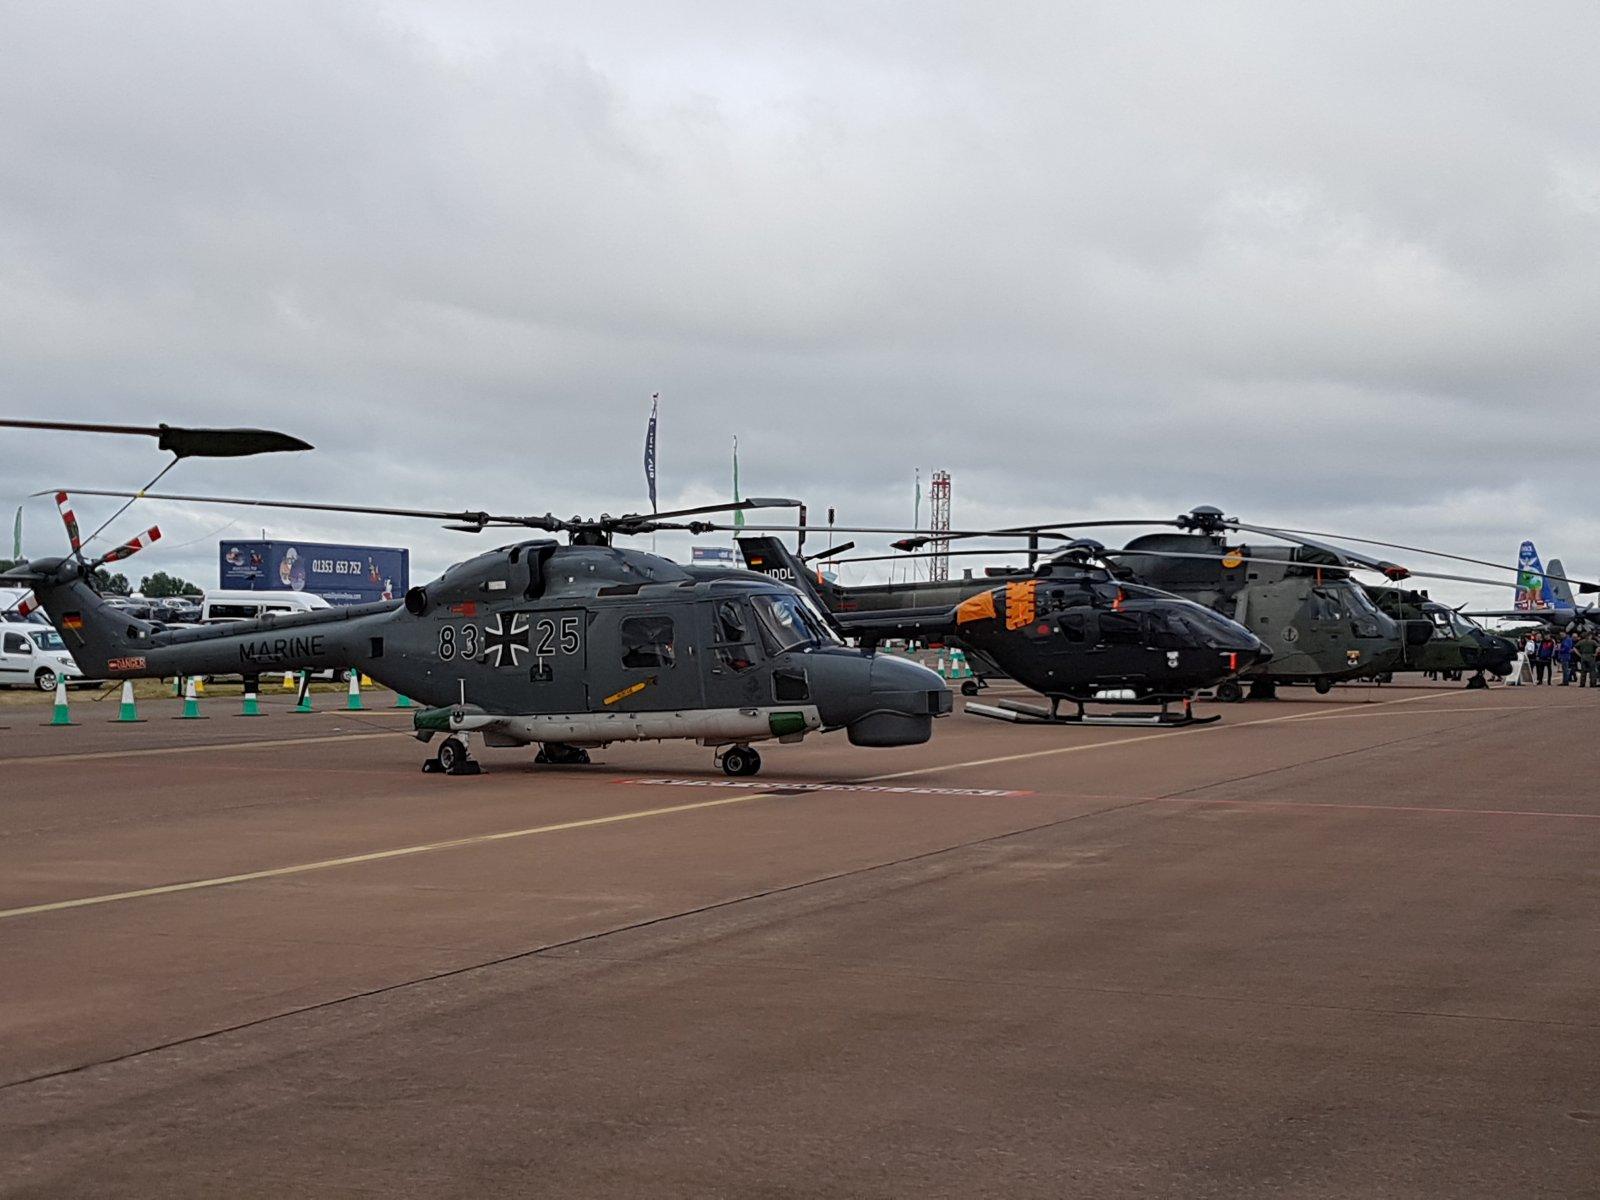 Koptereita, ensimmäisenä Saksan Navyn Westland Lynx Mk88A, 83+25